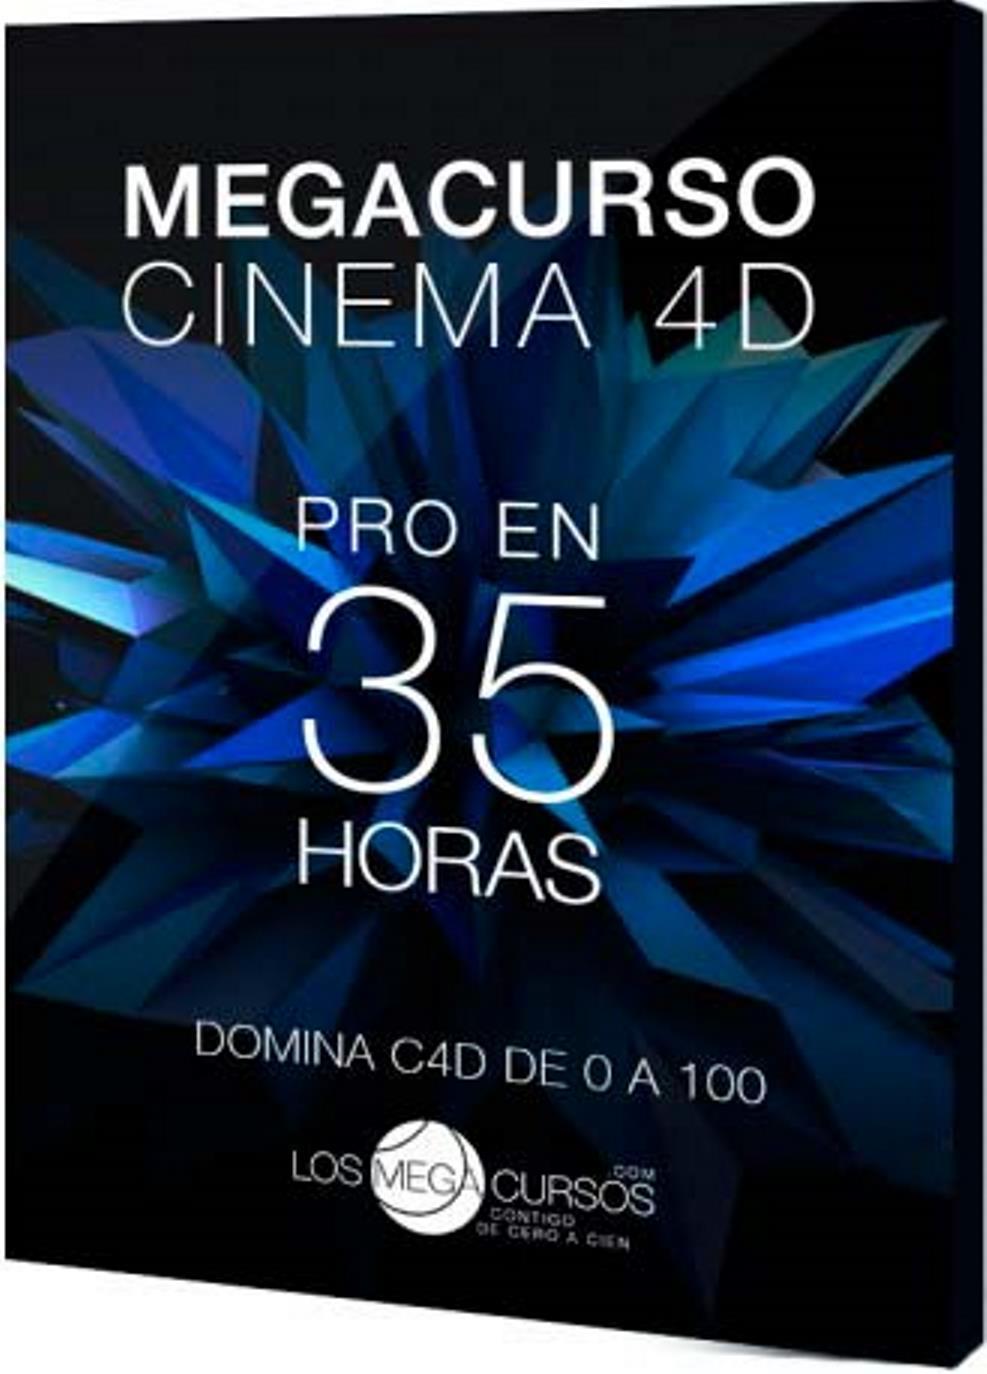 Megacurso de Cinema 4D: Pro en 35h